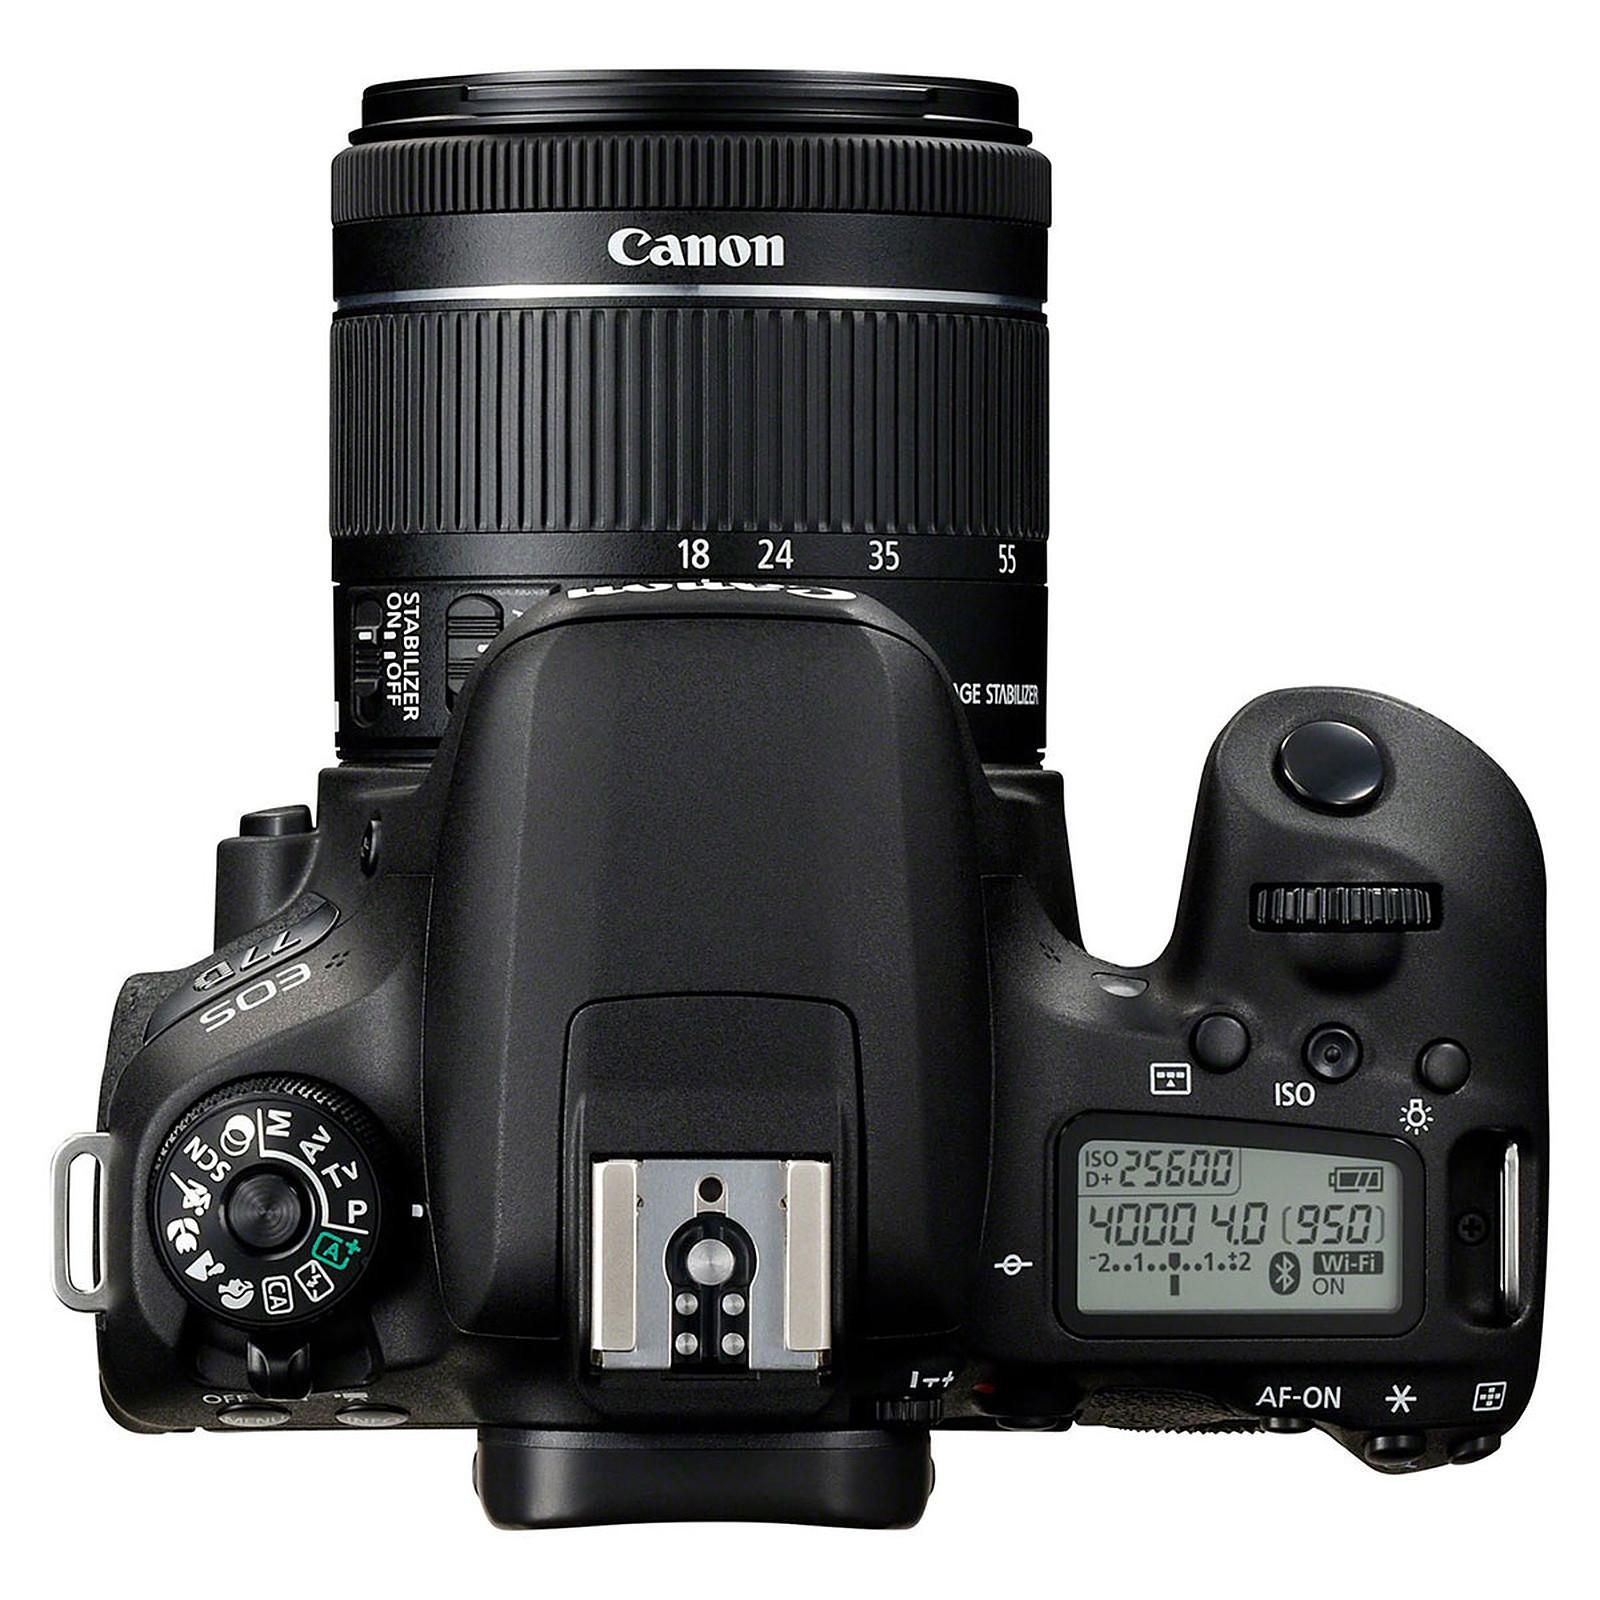 ... Acheter Canon EOS 77D + 18-55 IS STM + Tamron AF 70-300mm ...